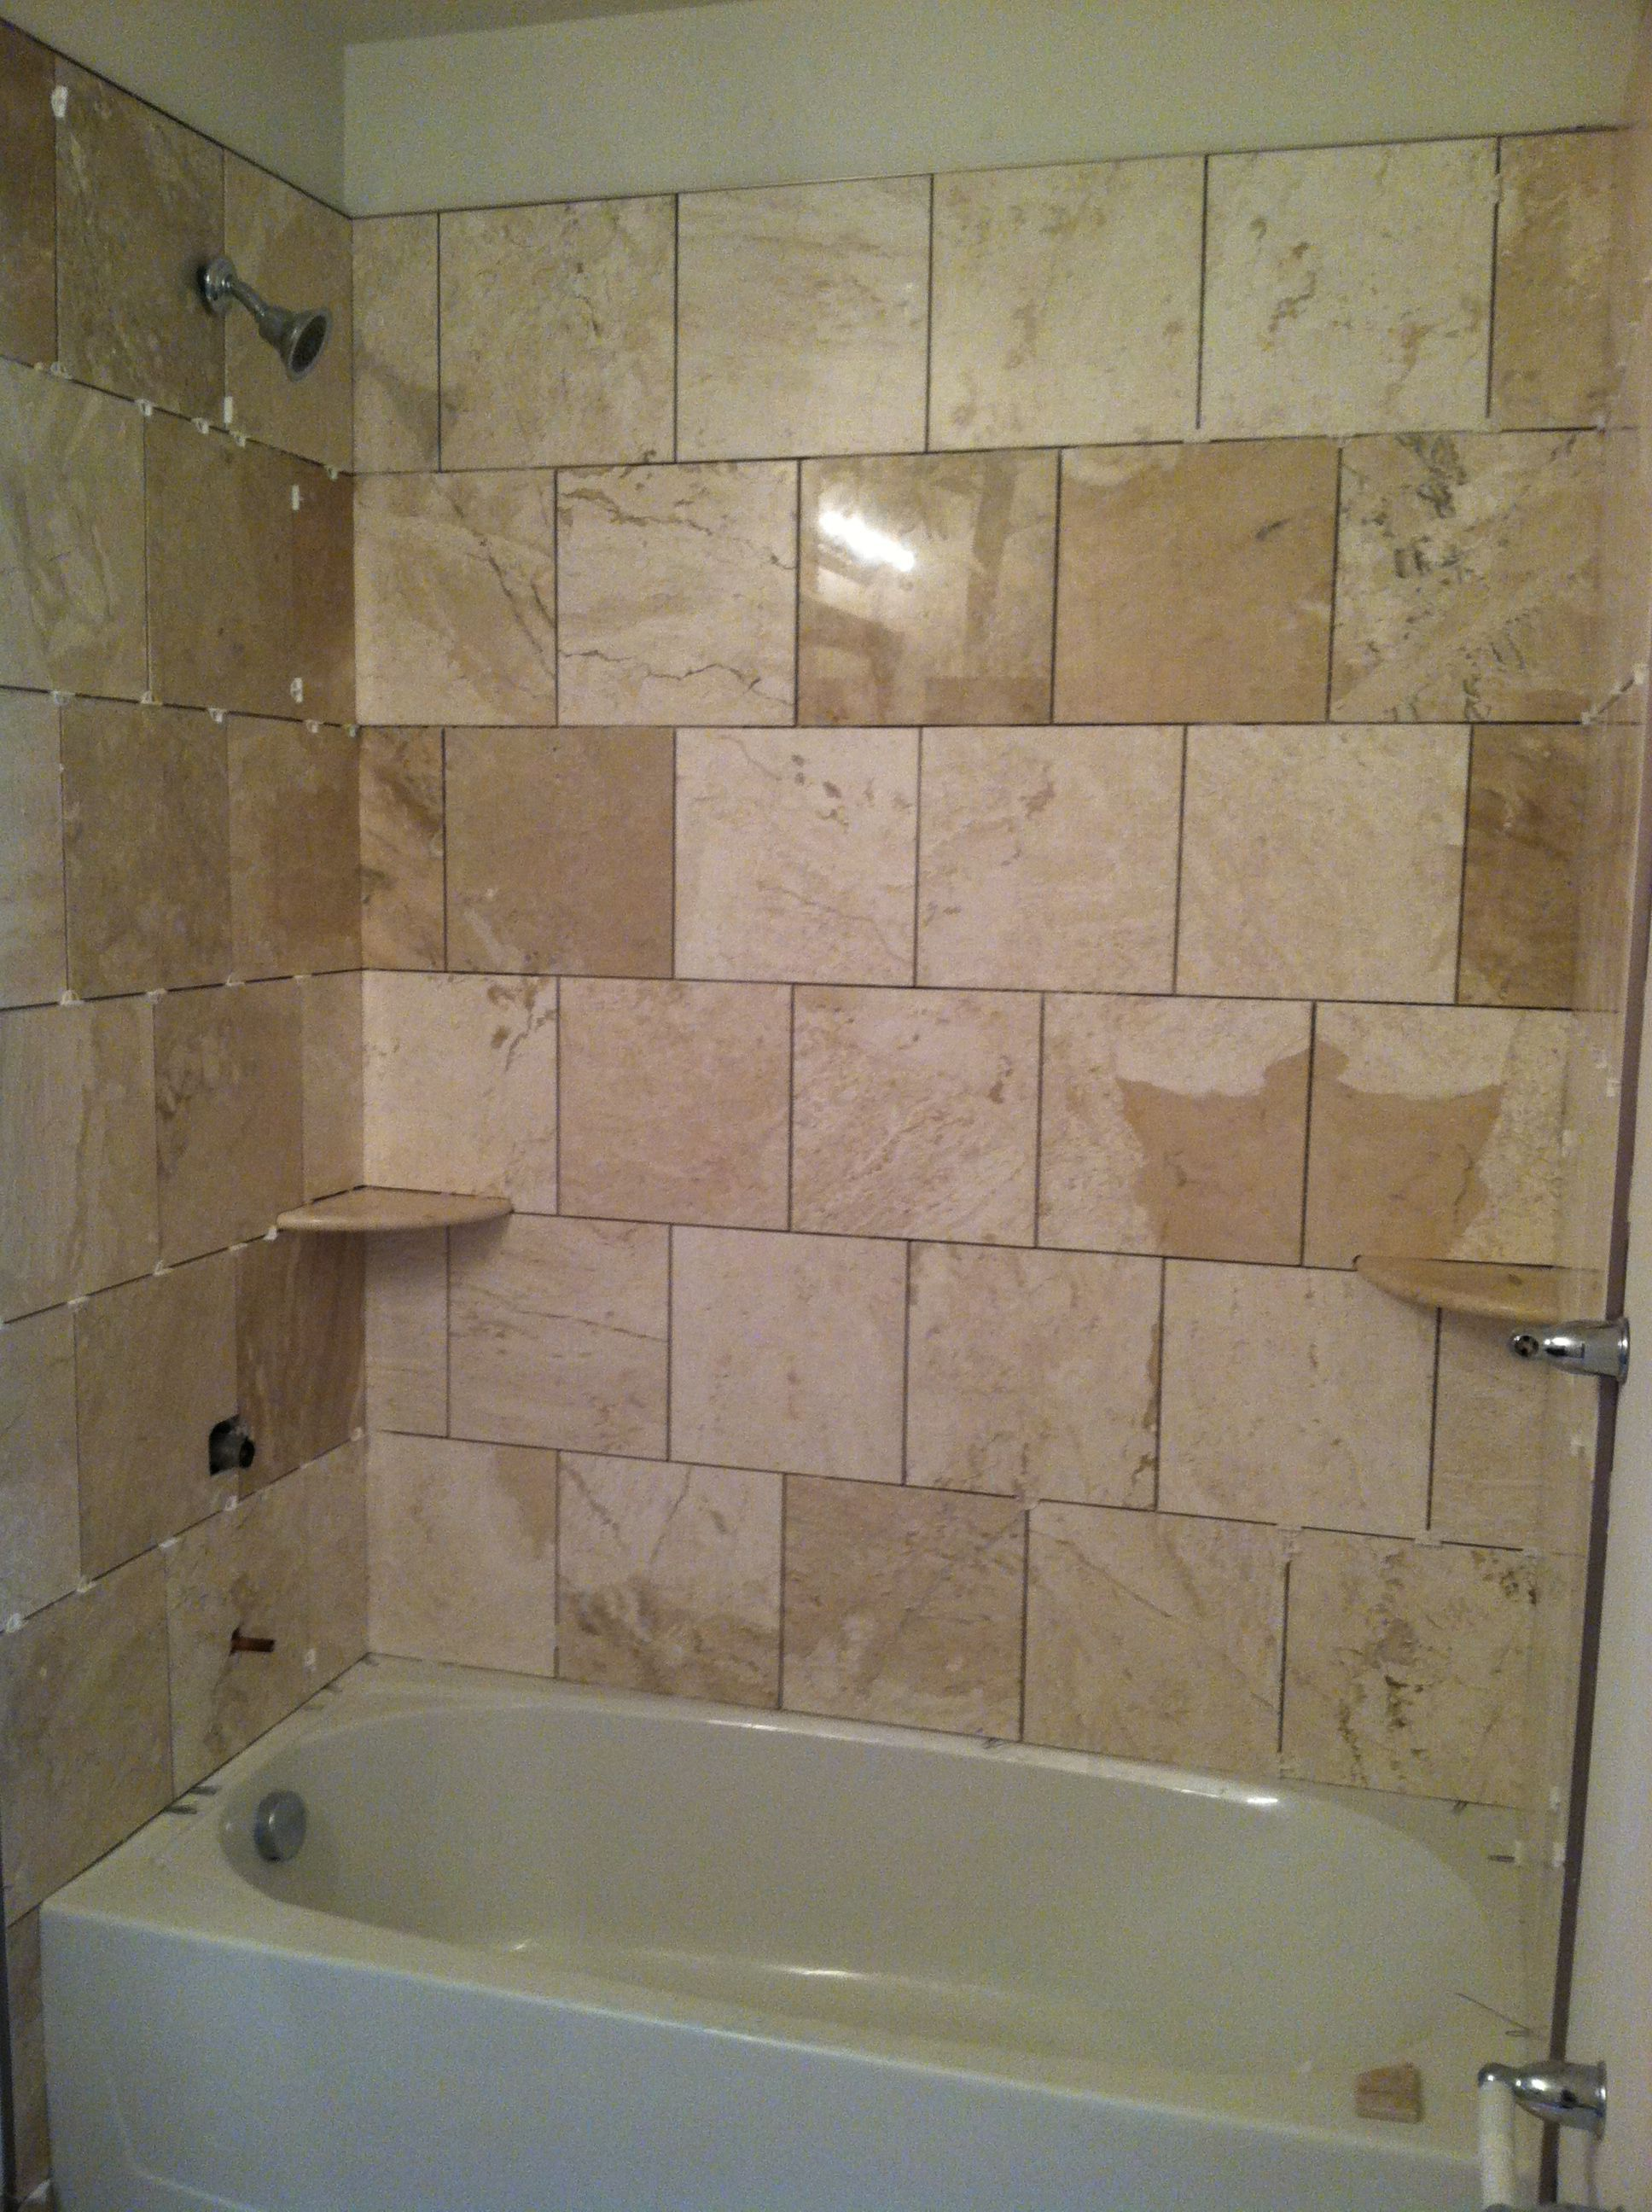 Lush Wall Decoration With Stylish Shower Tile